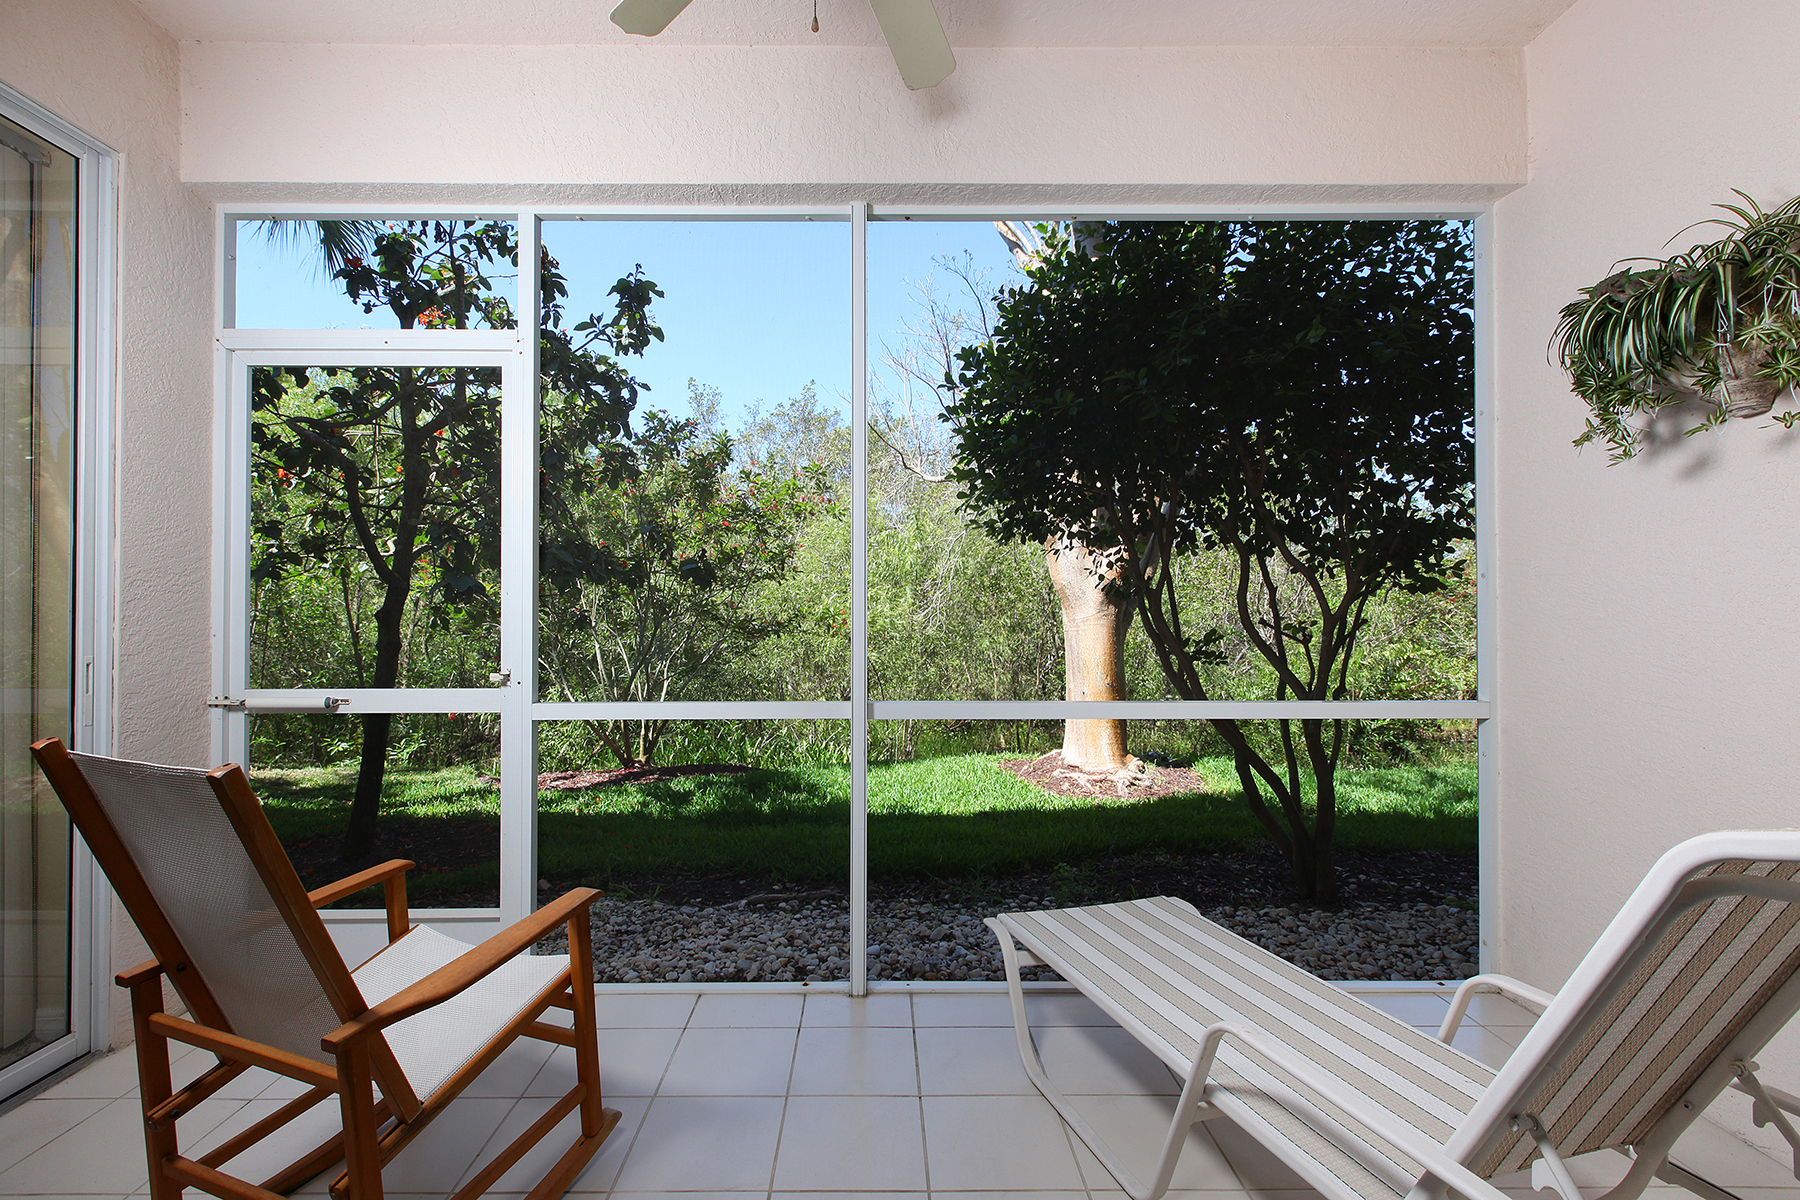 Condomínio para Venda às FIDDLER'S CREEK - WHISPER TRACE 8305 Whisper Trace Way 102 Naples, Florida, 34114 Estados Unidos